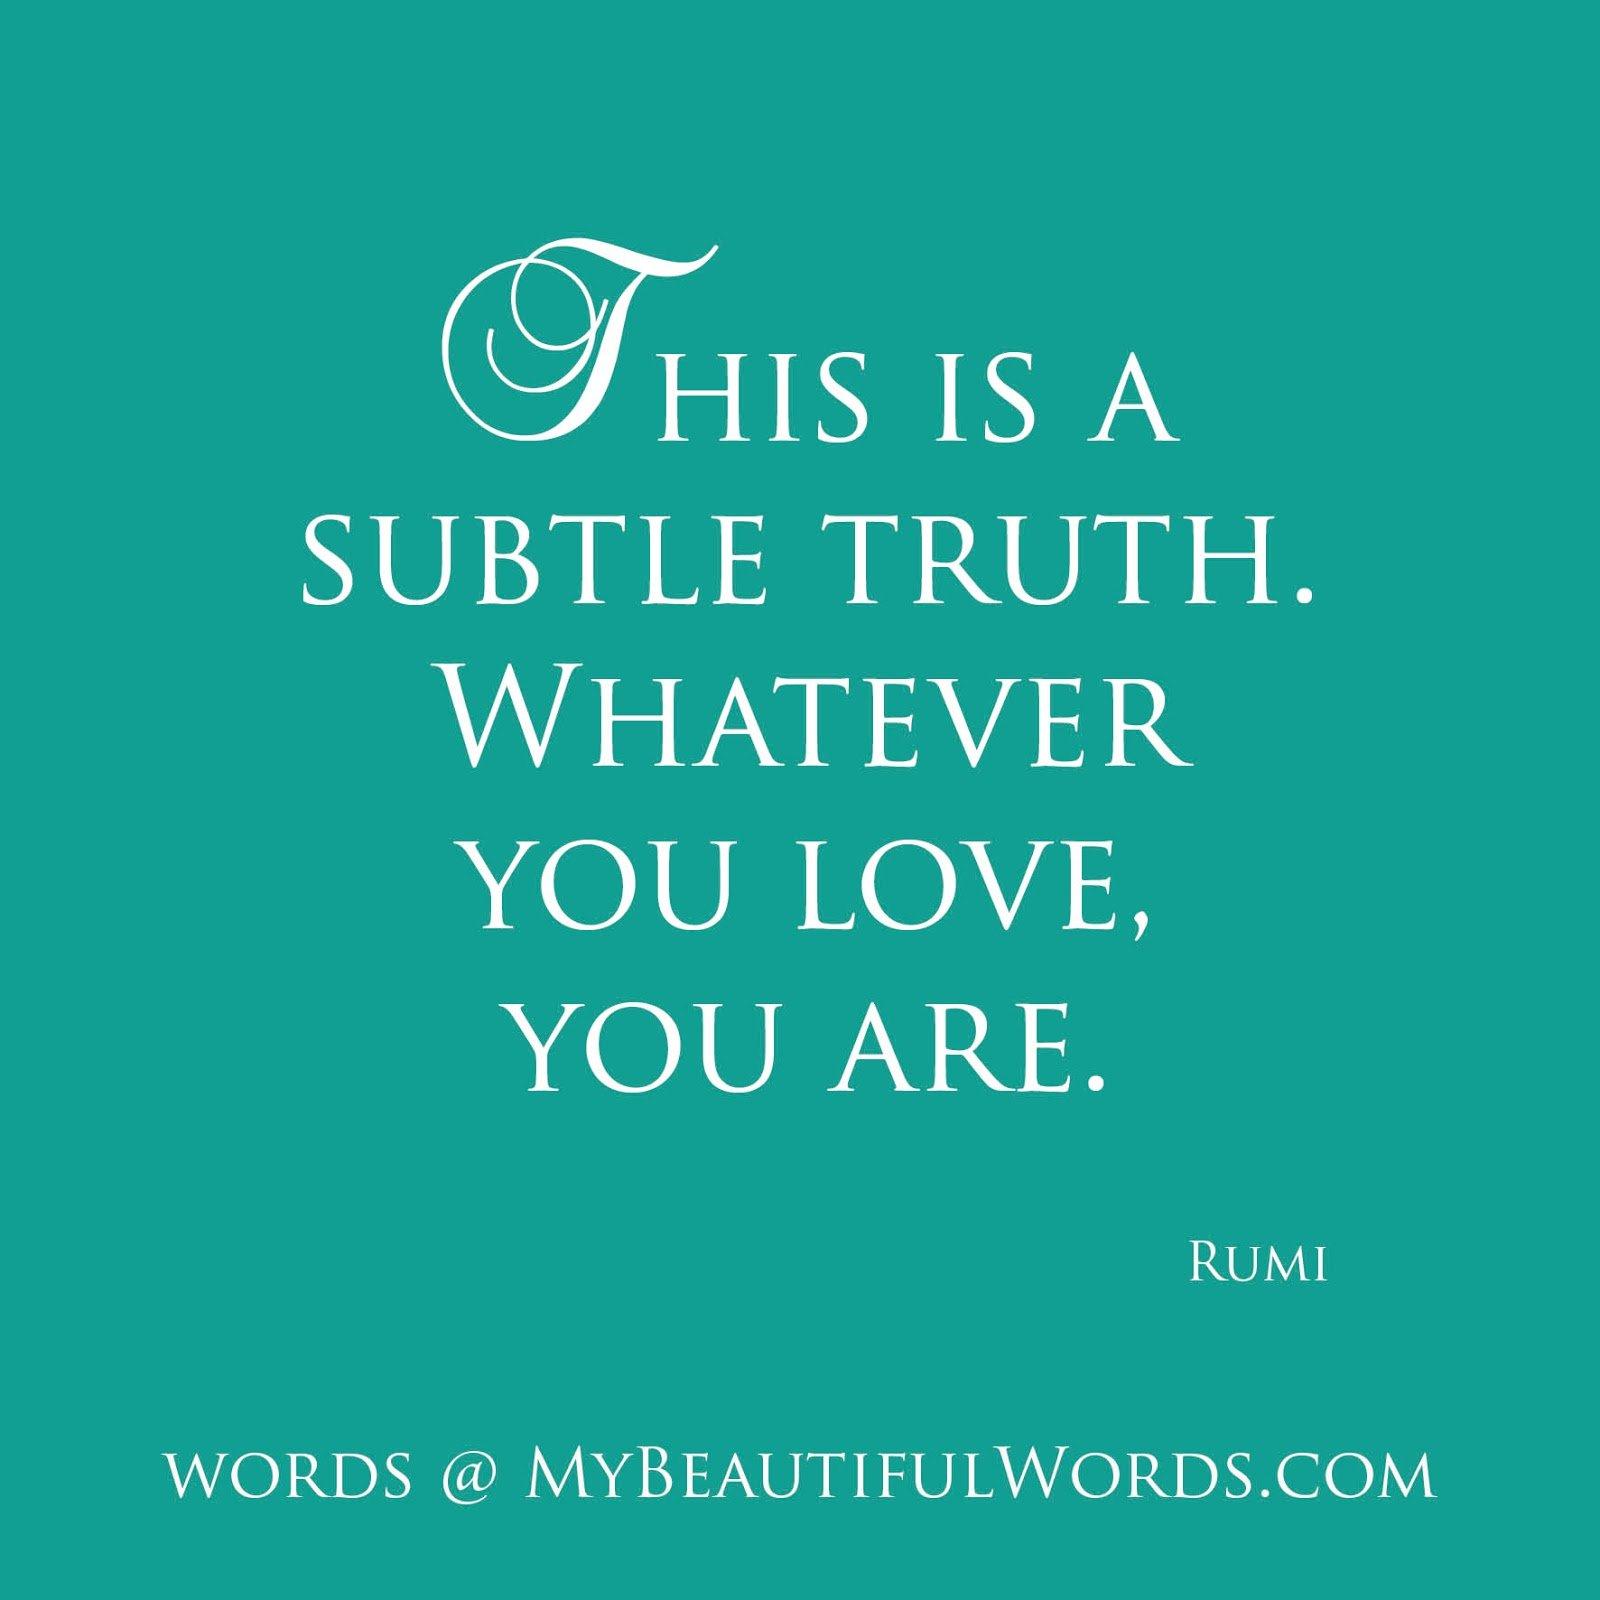 Love Quotes Love: Rumi Quotes About Love. QuotesGram